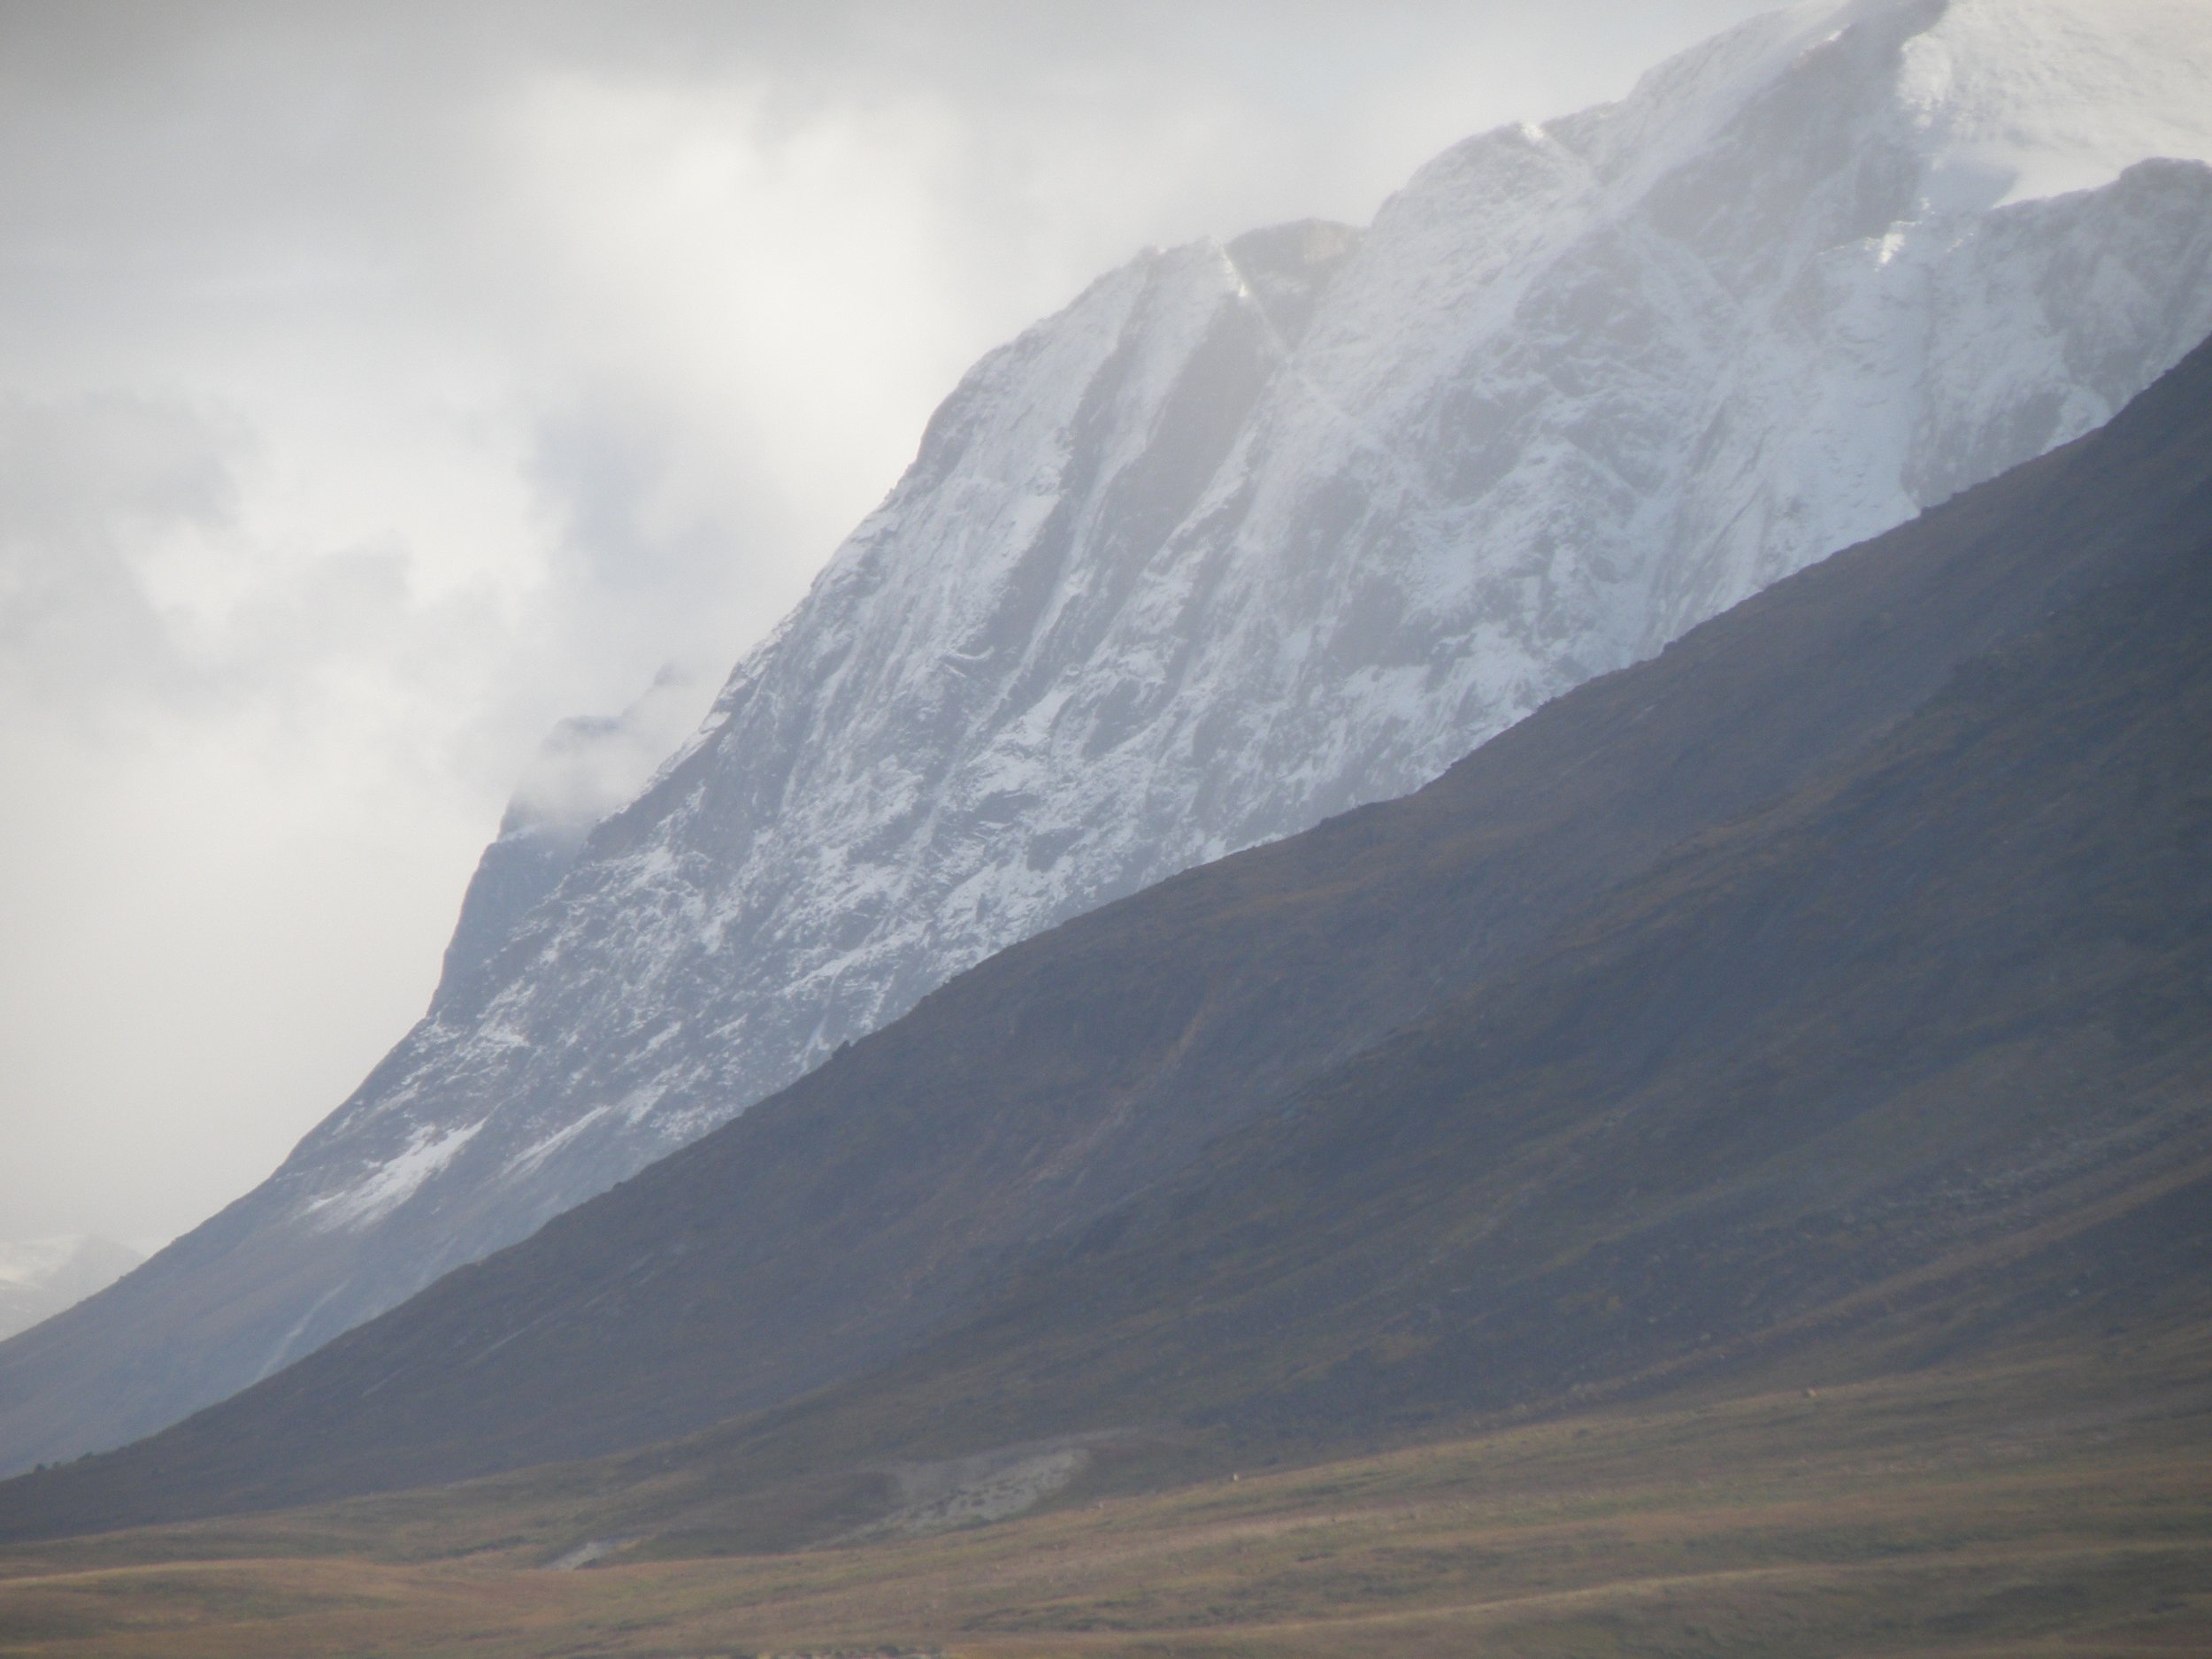 Mountain Wall.jpg